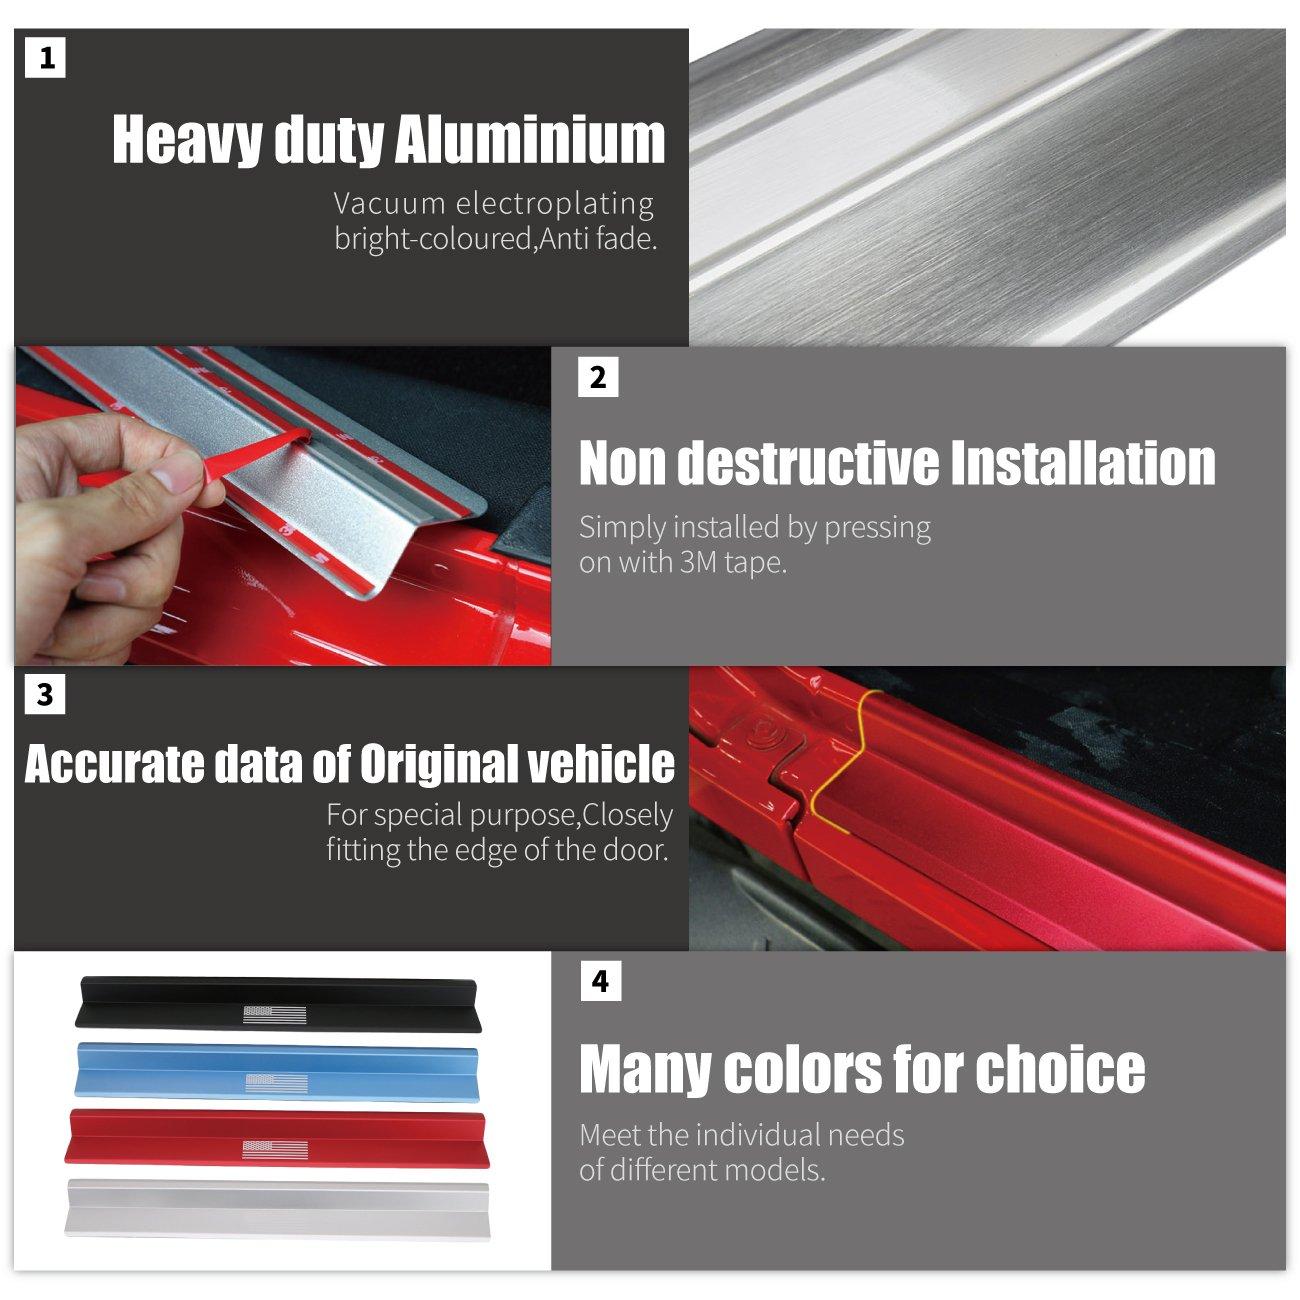 Red Aluminum Alloy Door Sill Guard Entry Guards Protector for 2007-2017 Jeep Wrangler JK 4Door/